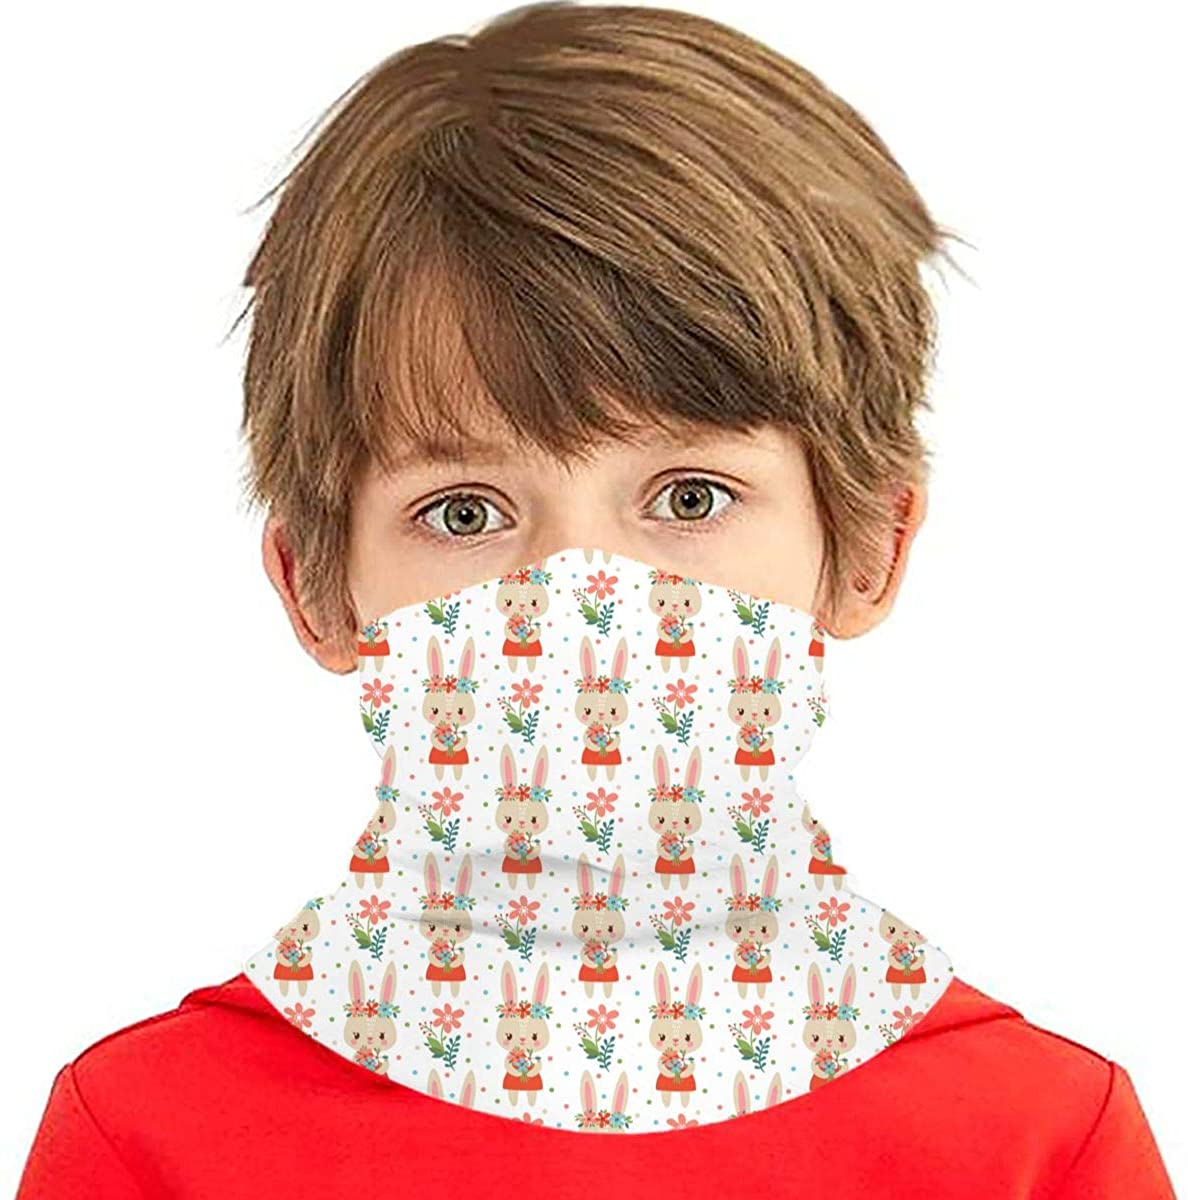 Lovely Childish Wallpaper Neck Gaiter Face Mask Bandana Dust Wind Sun UV Balaclava for Teen Boy Girl Outdoors